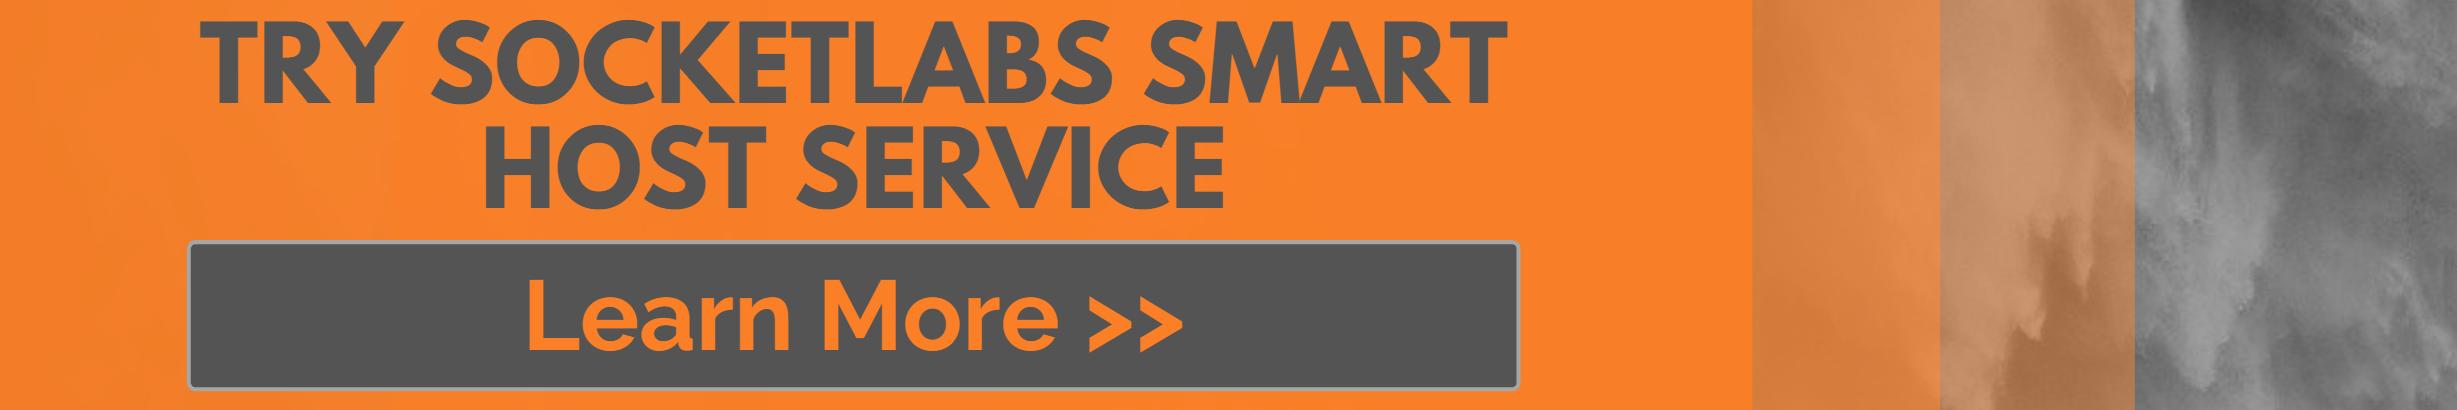 smart host service provider